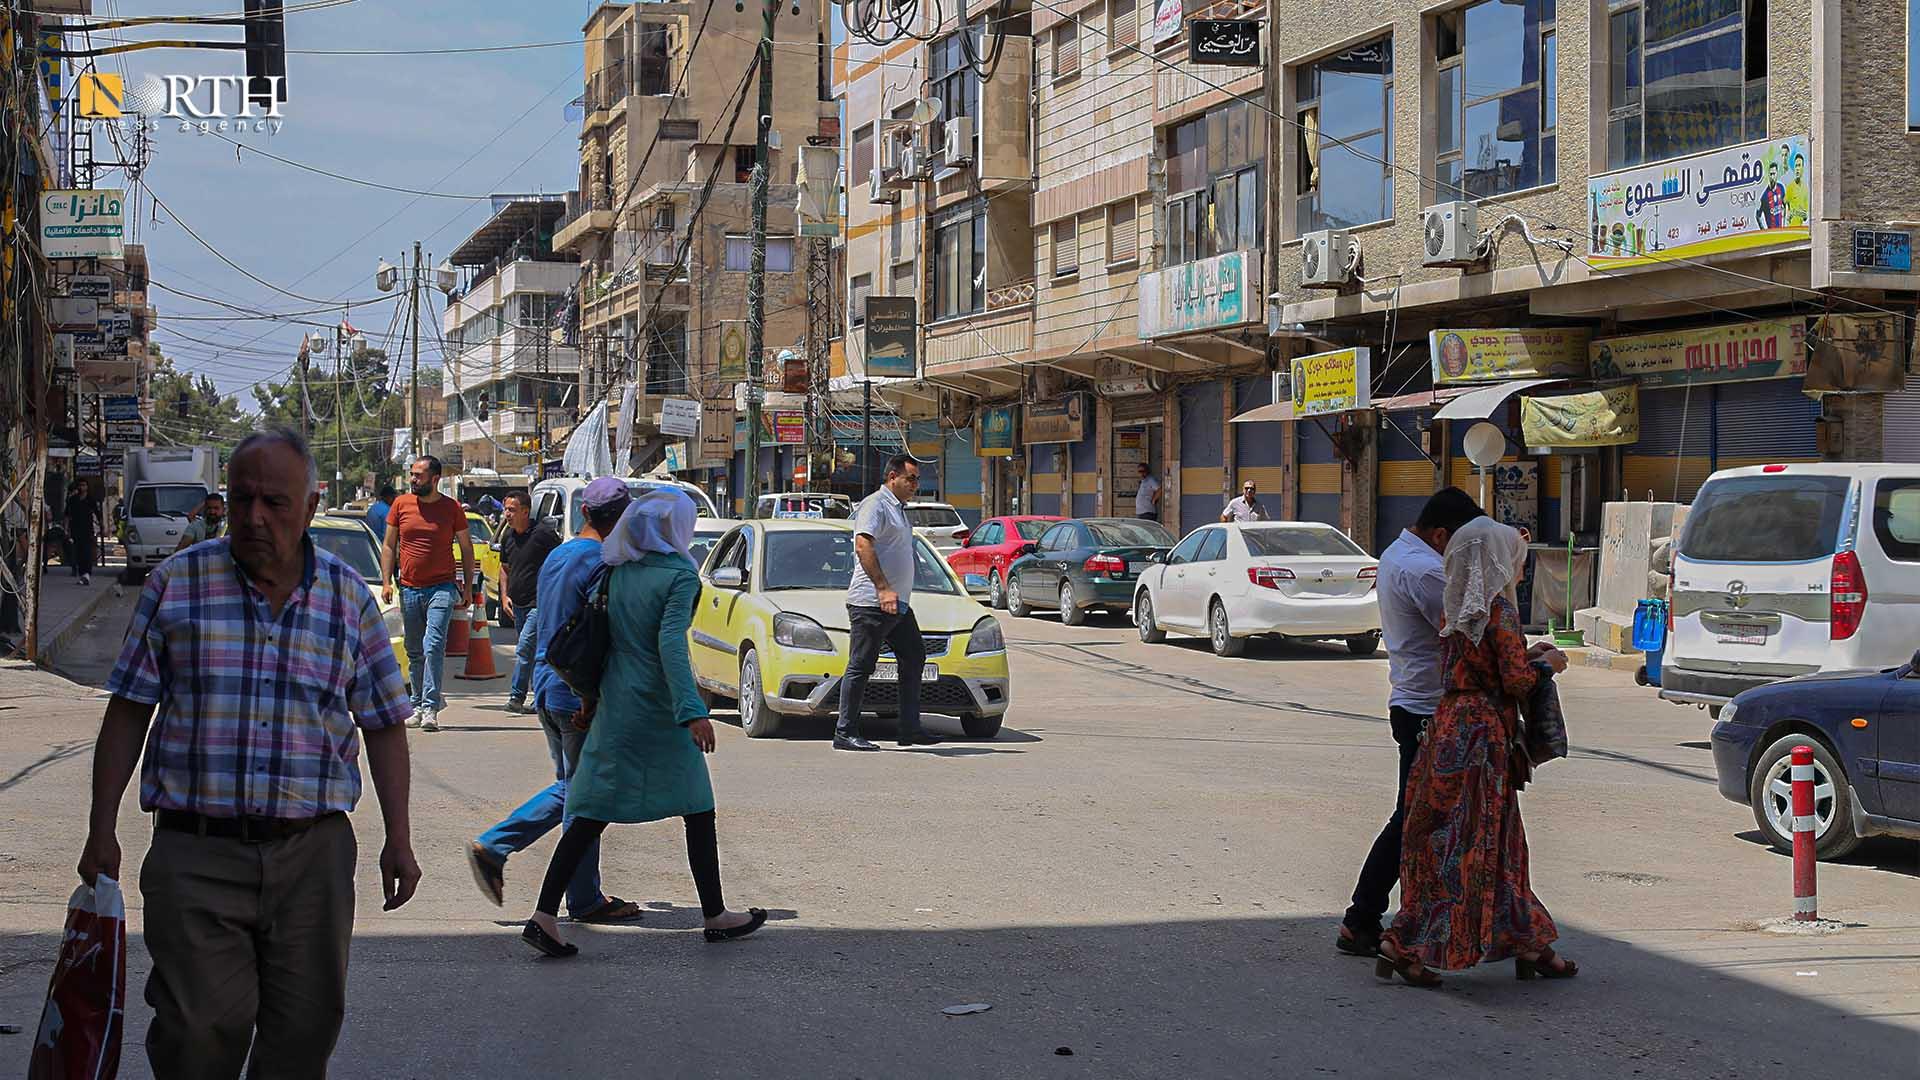 Main Street in the city of Qamishli – North Press